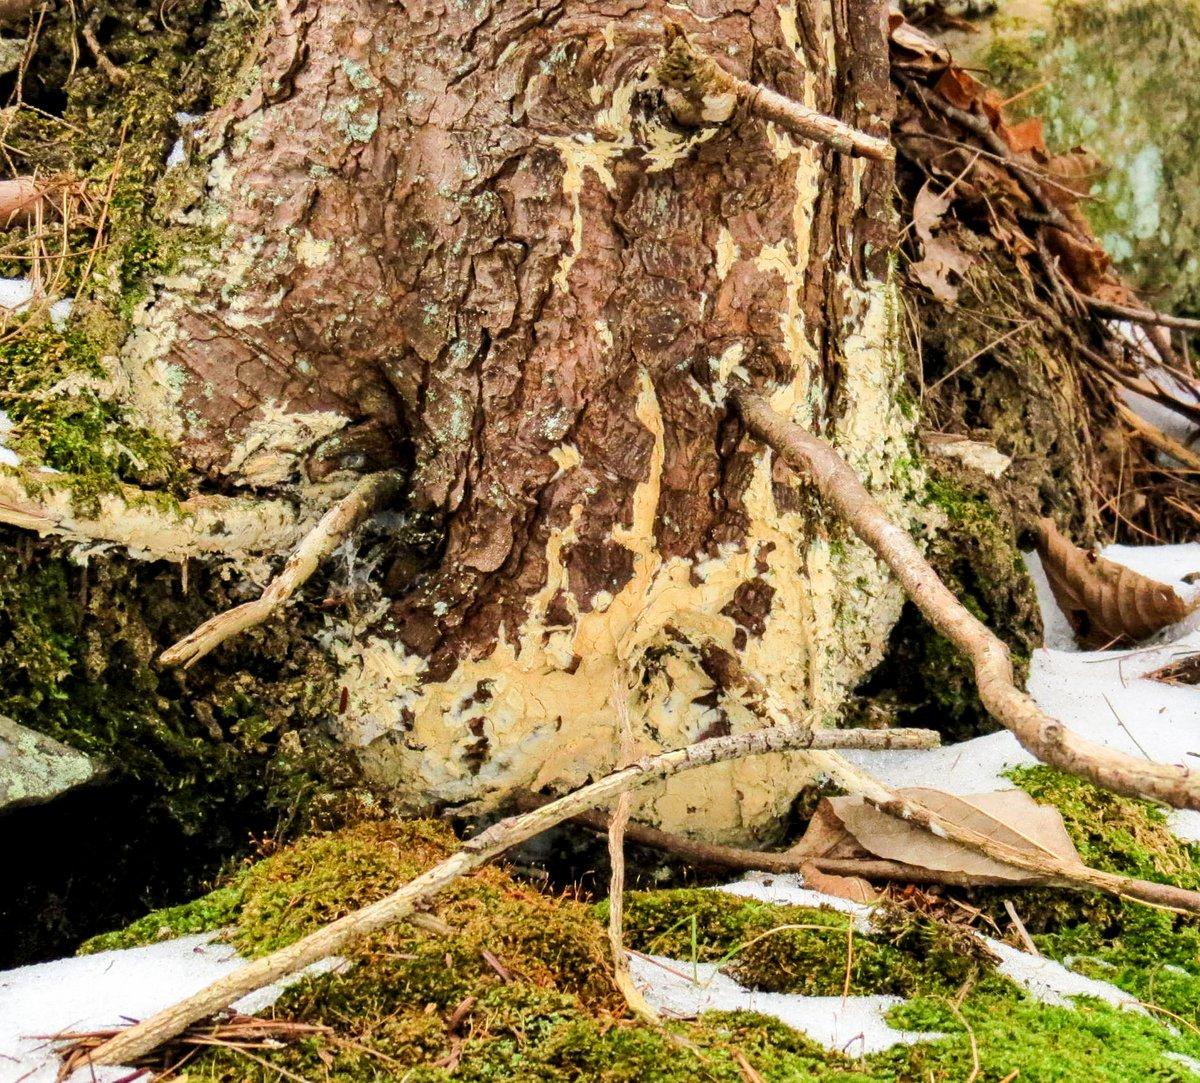 9. Yellow Crust Fungus on Hemlock